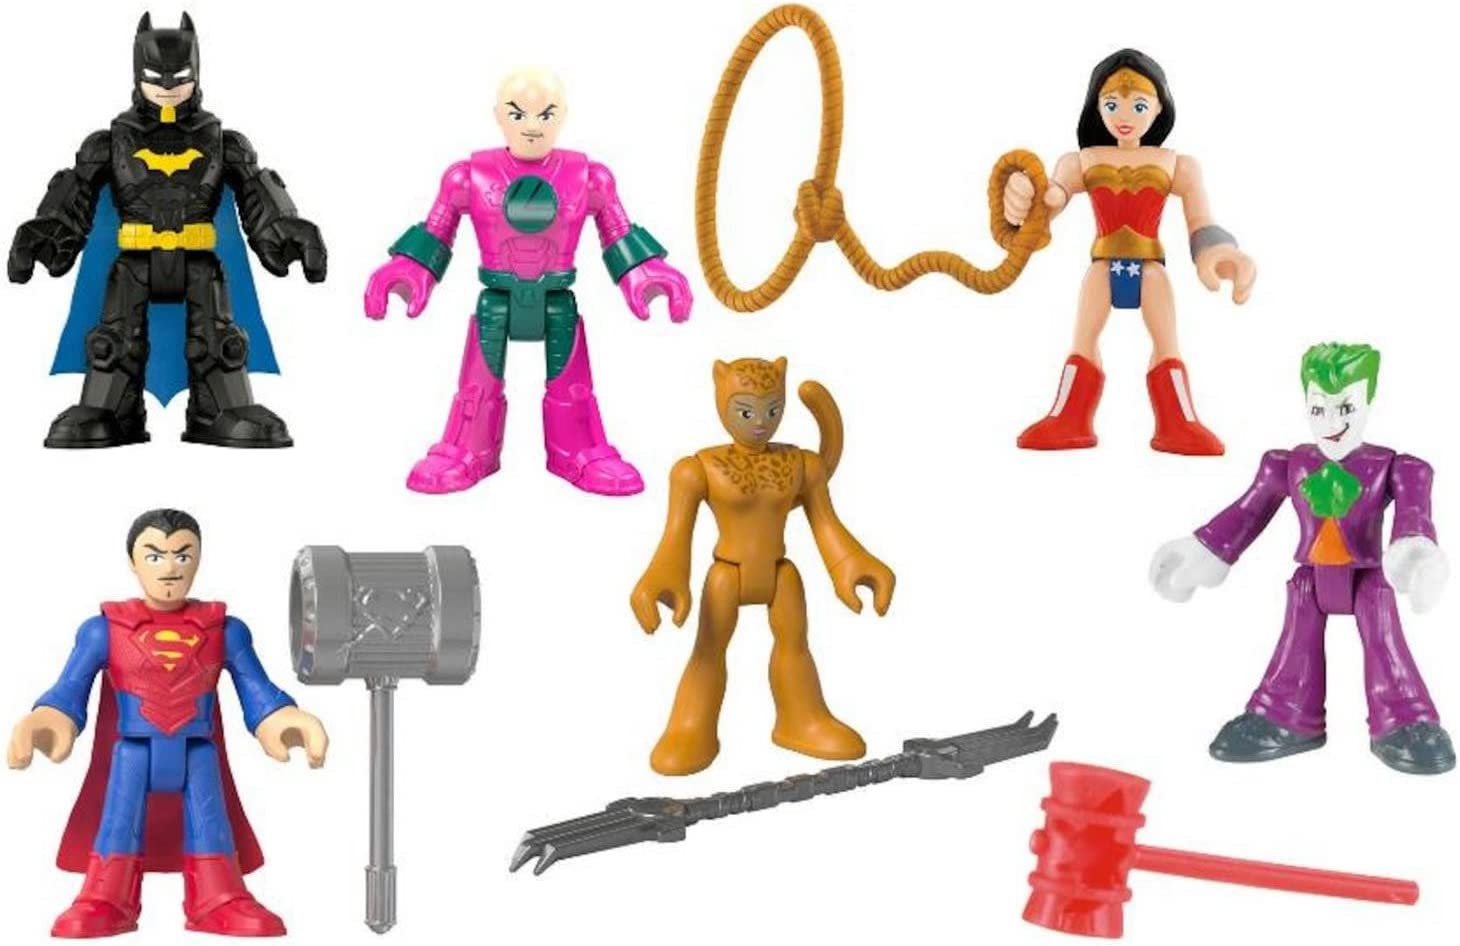 Lot 3 Imaginext DC Super Friends BAT GIRL BATMAN Fisher Price figure Comics Toys